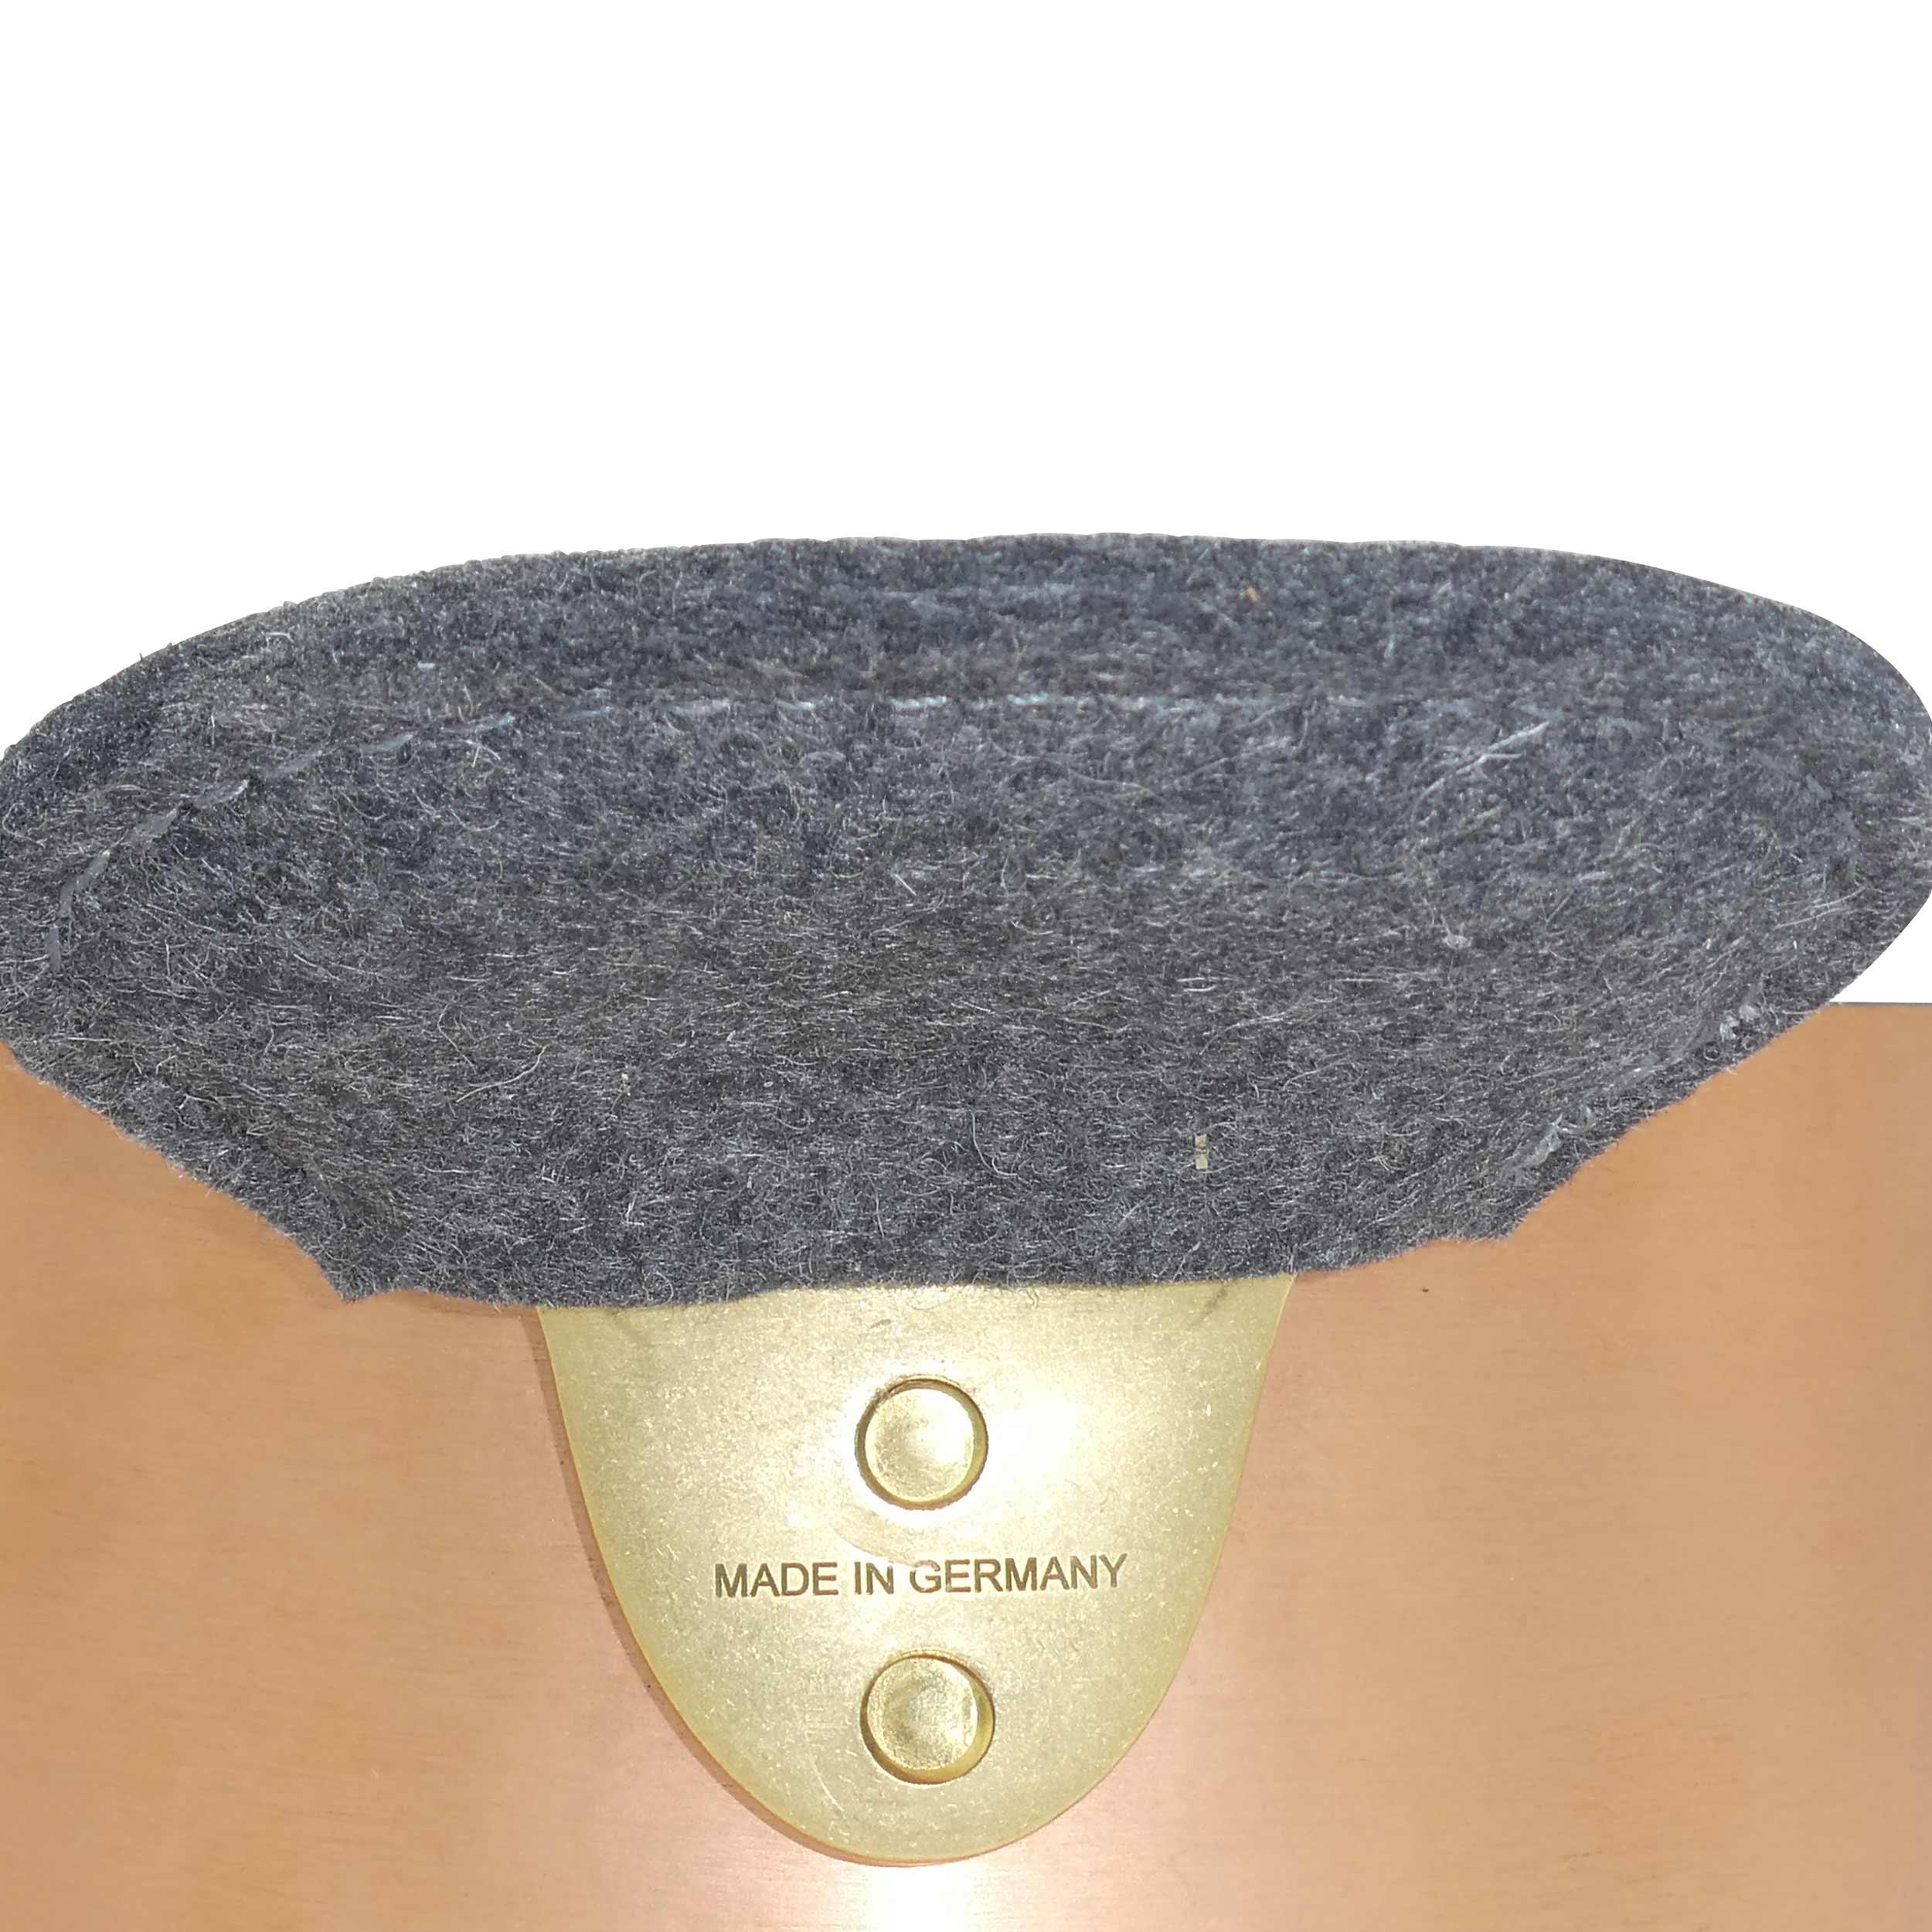 Kupfermanufaktur 2 x Topfgriffe Set 7004-01